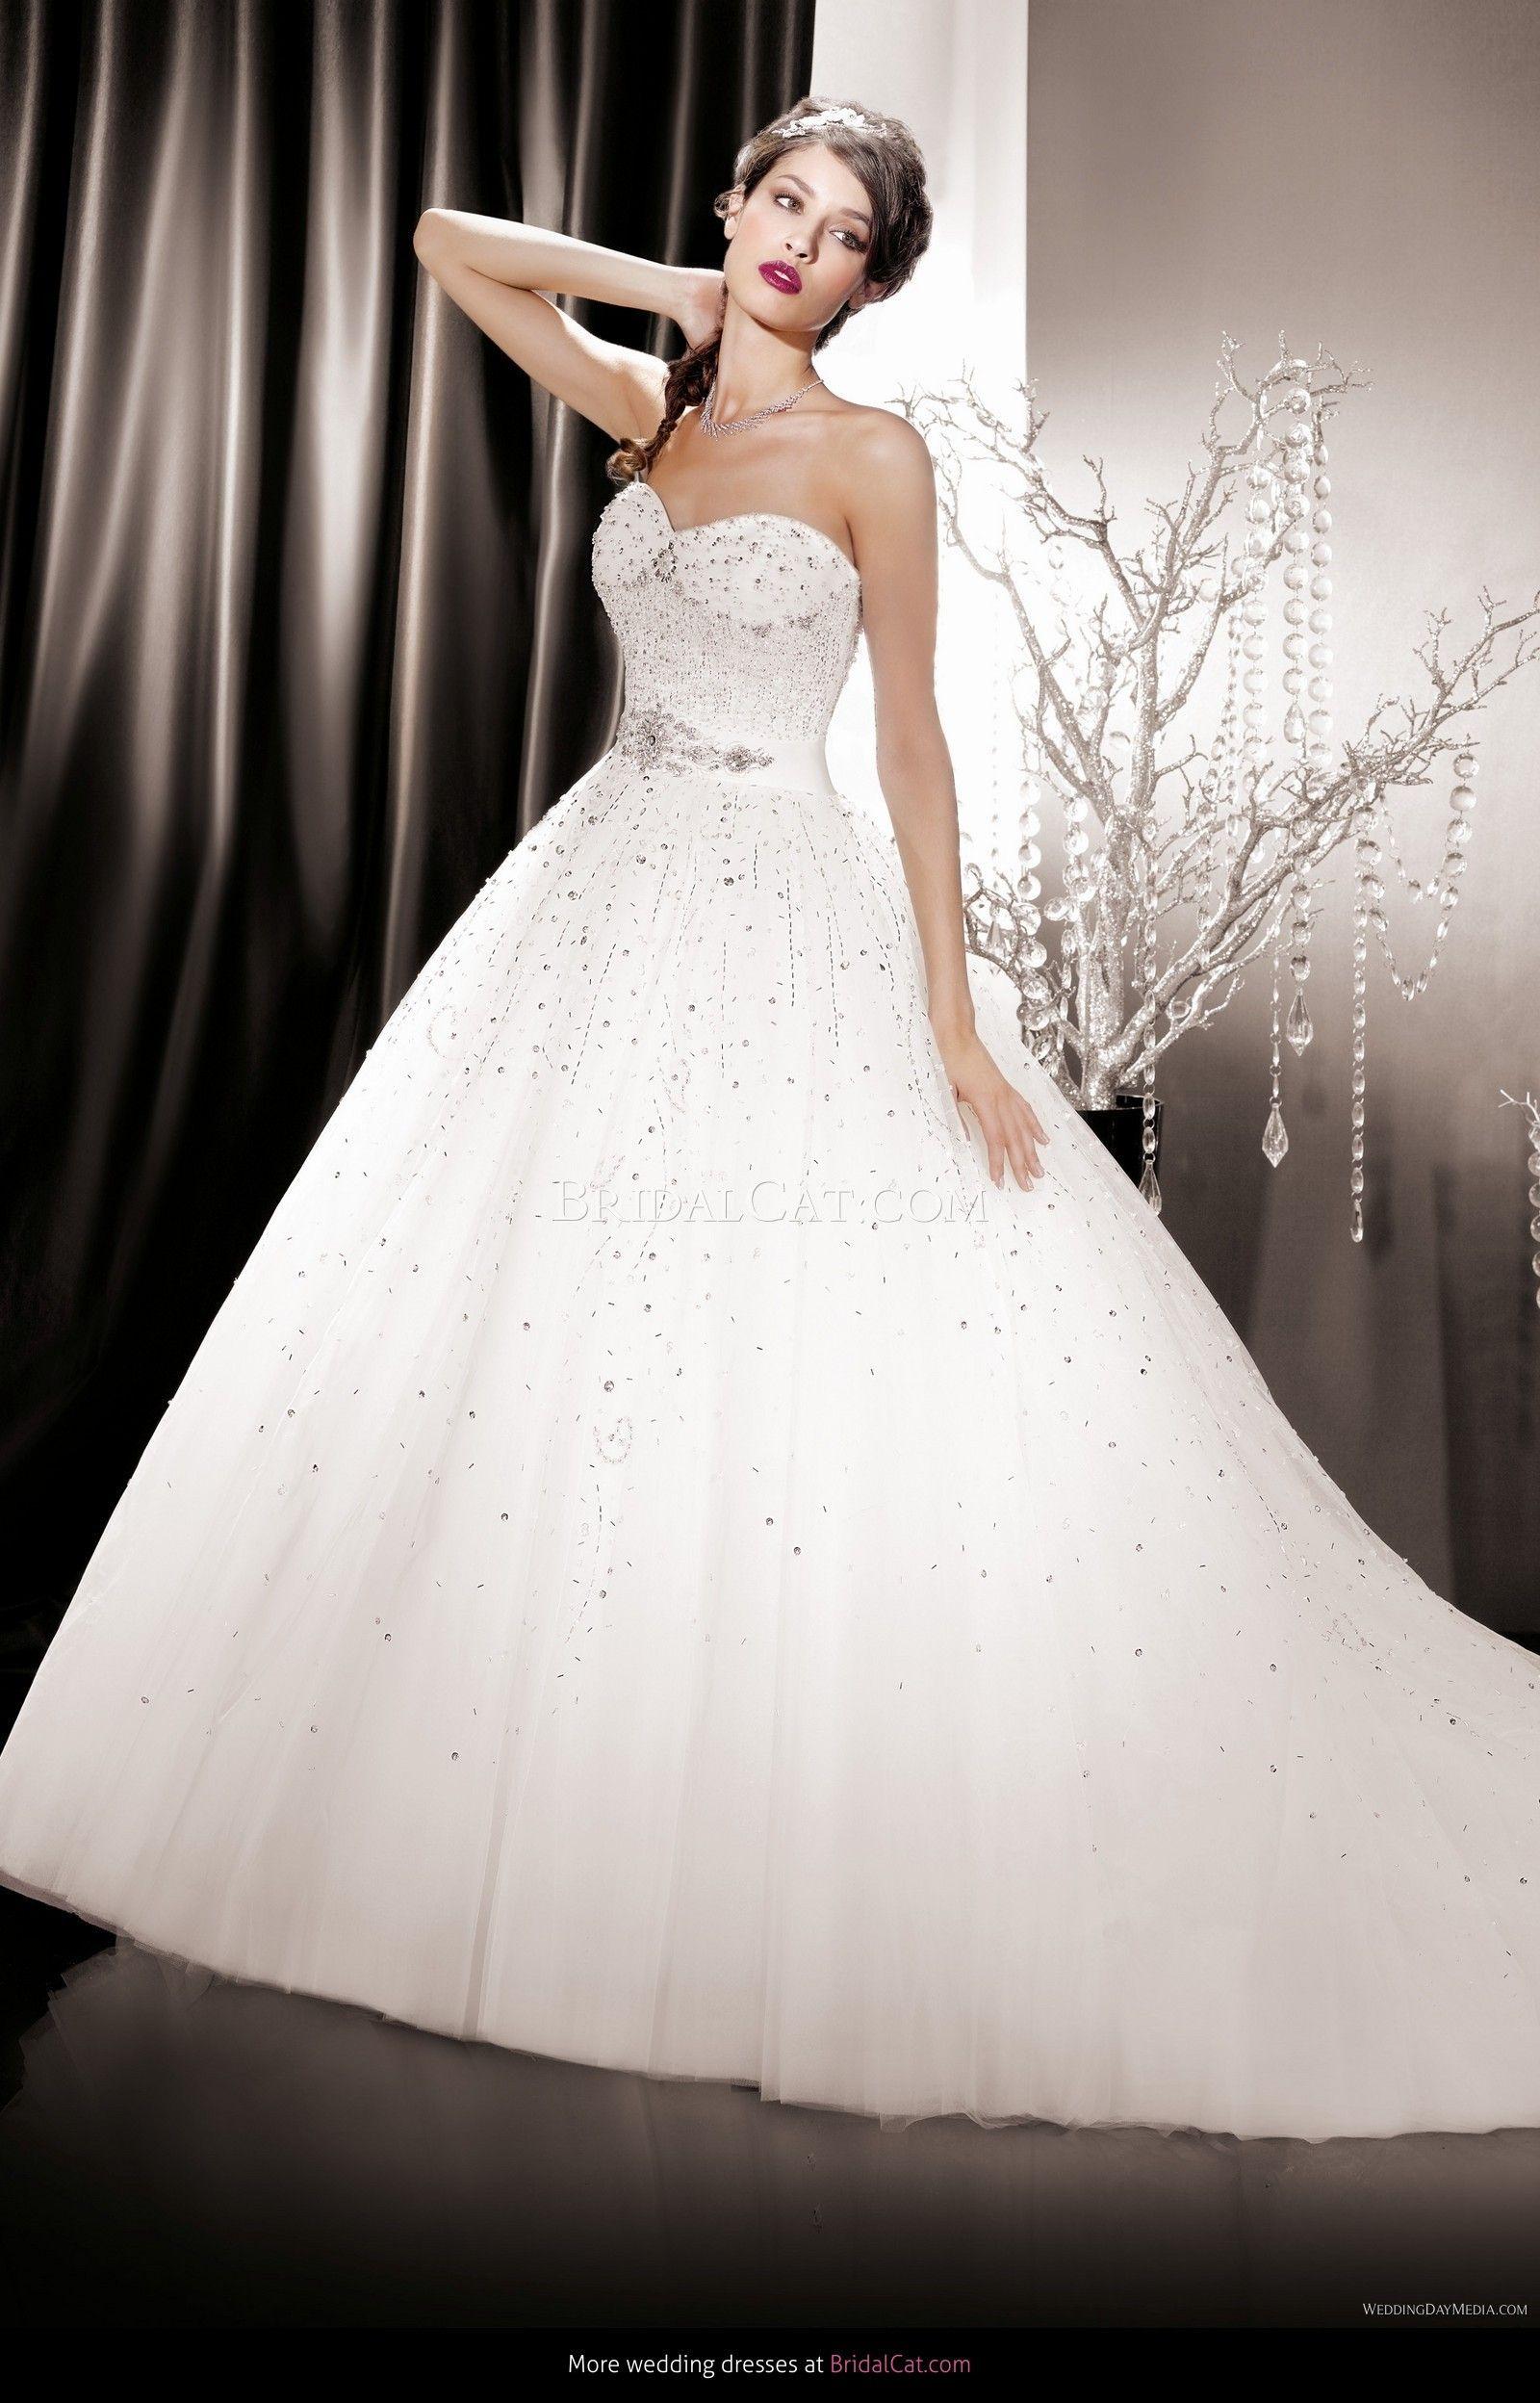 2014 KS 146-06 #wedding_dress #gorgeous #strapless_wedding_dress #stunning_wedding_dress